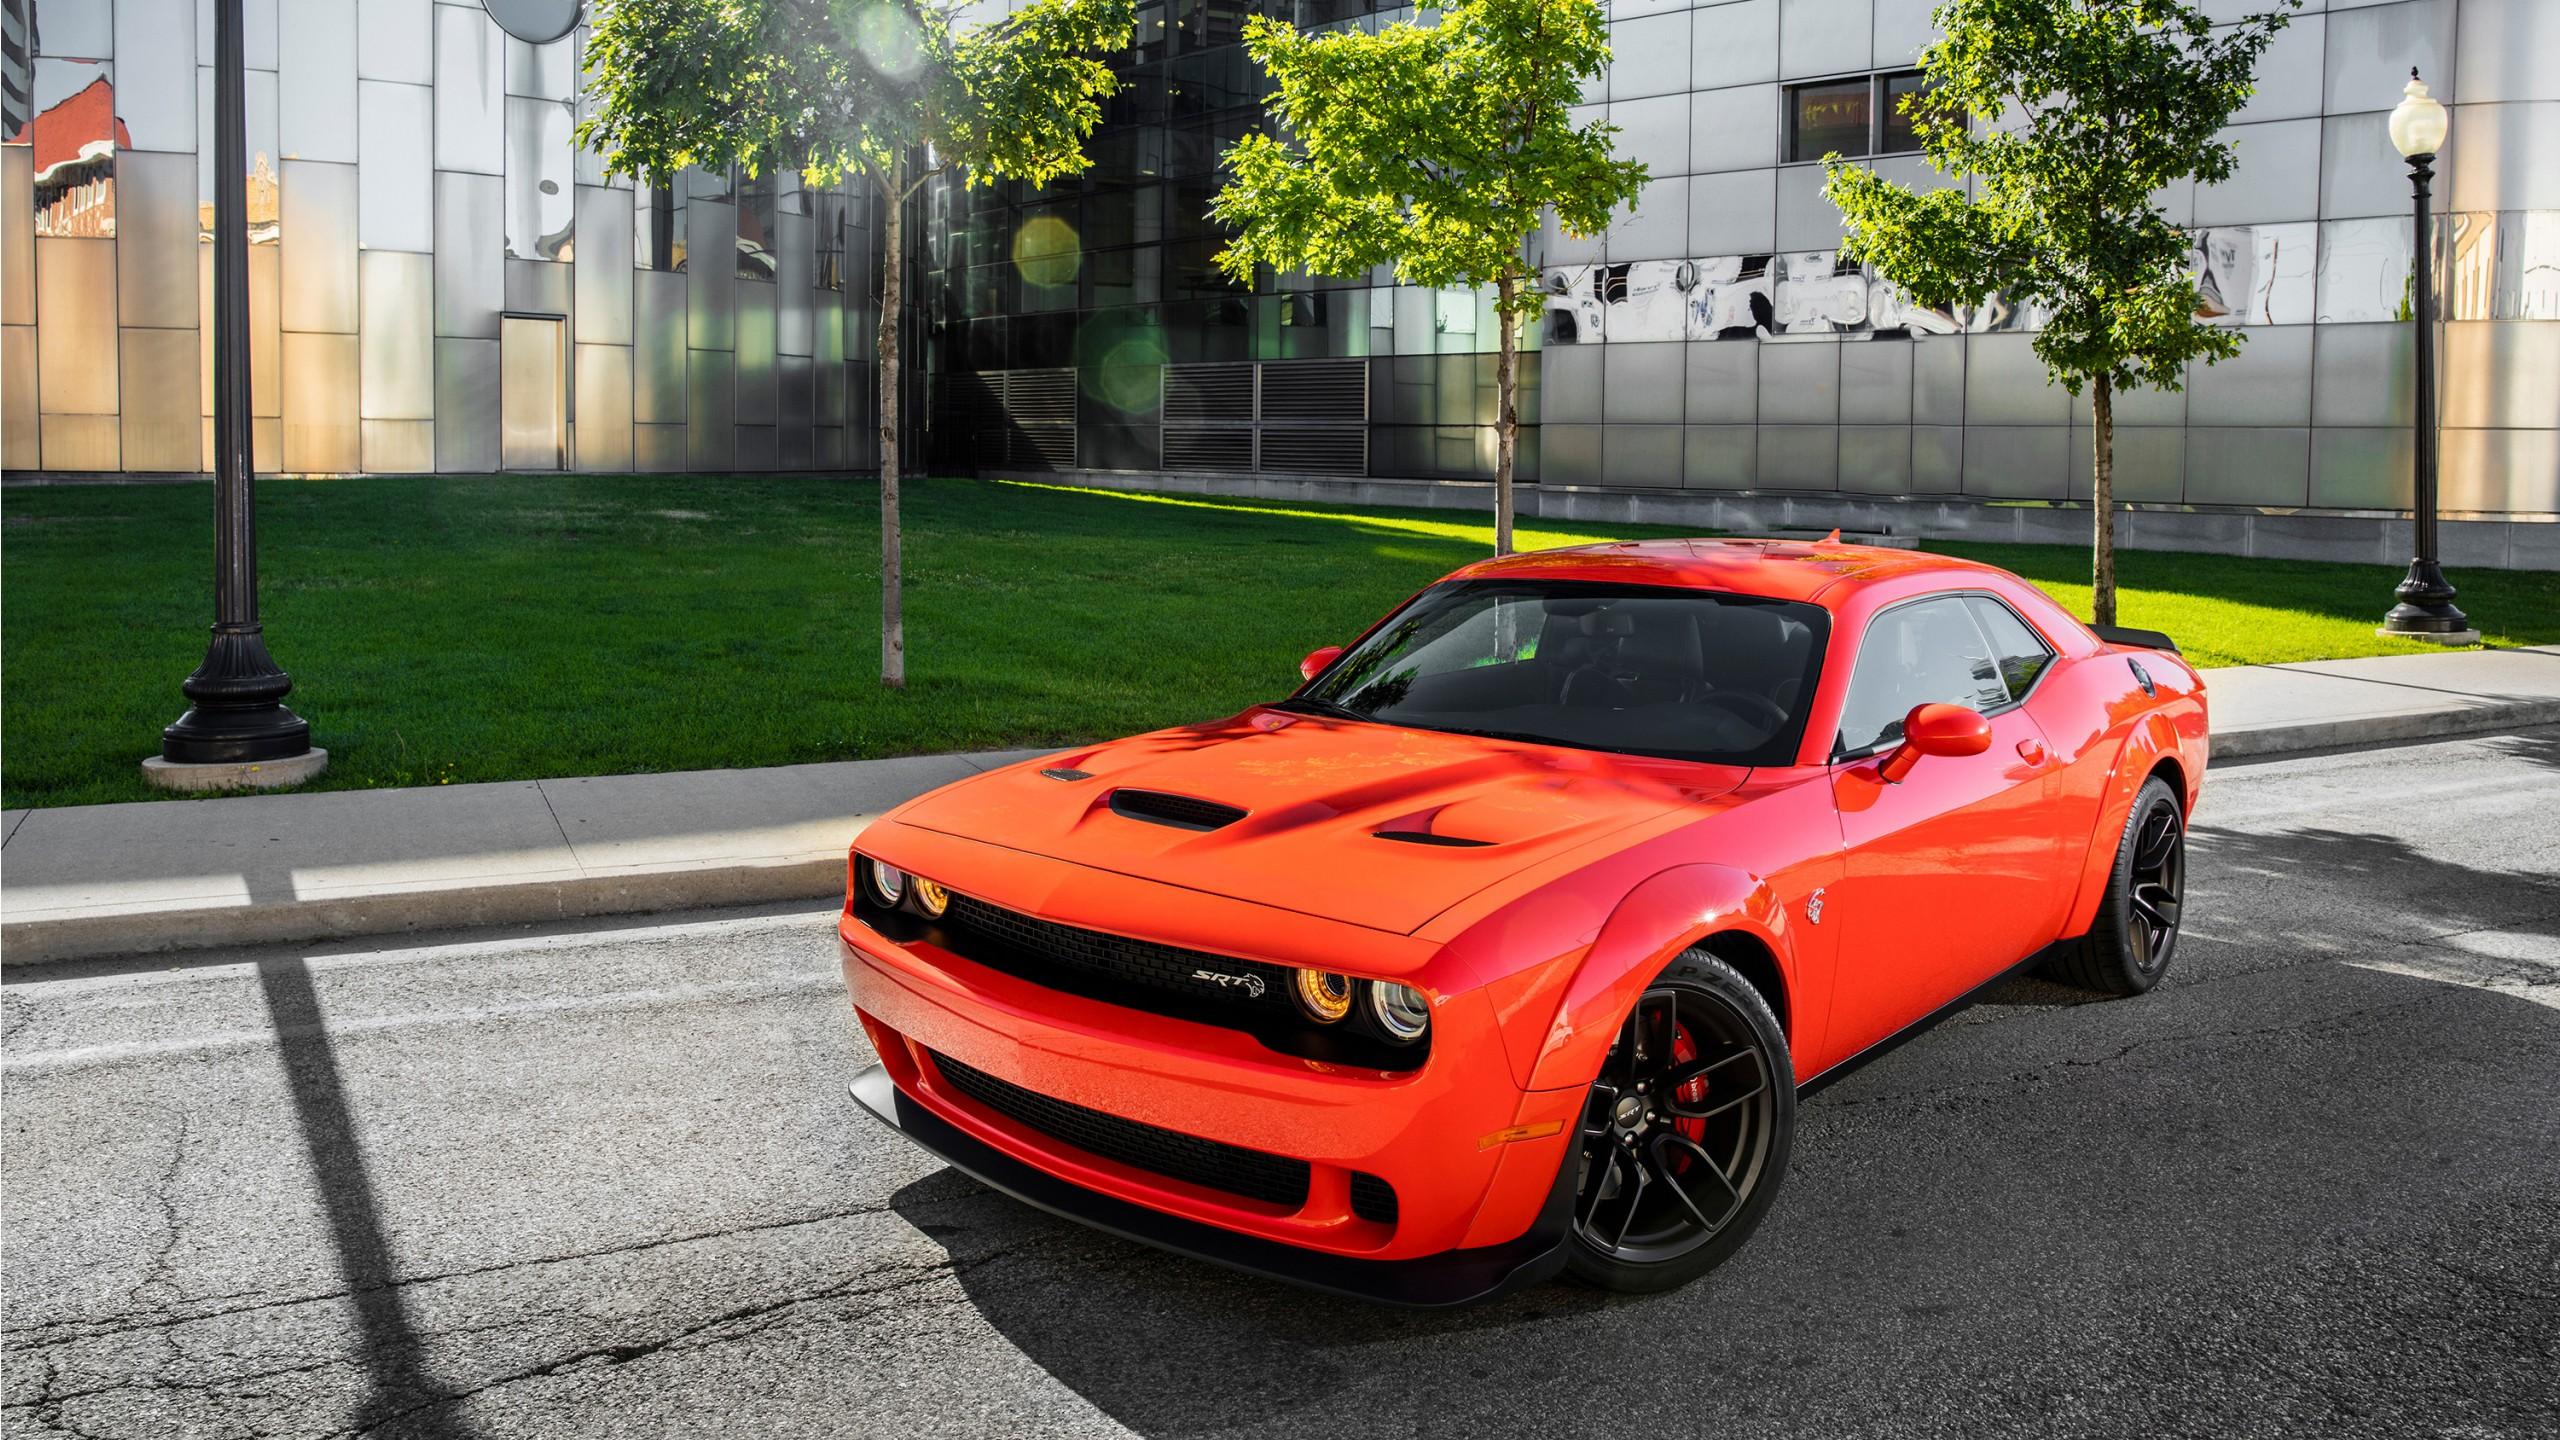 Go Mango Charger >> 2018 Dodge Challenger SRT Hellcat Widebody 7 Wallpaper | HD Car Wallpapers | ID #8012